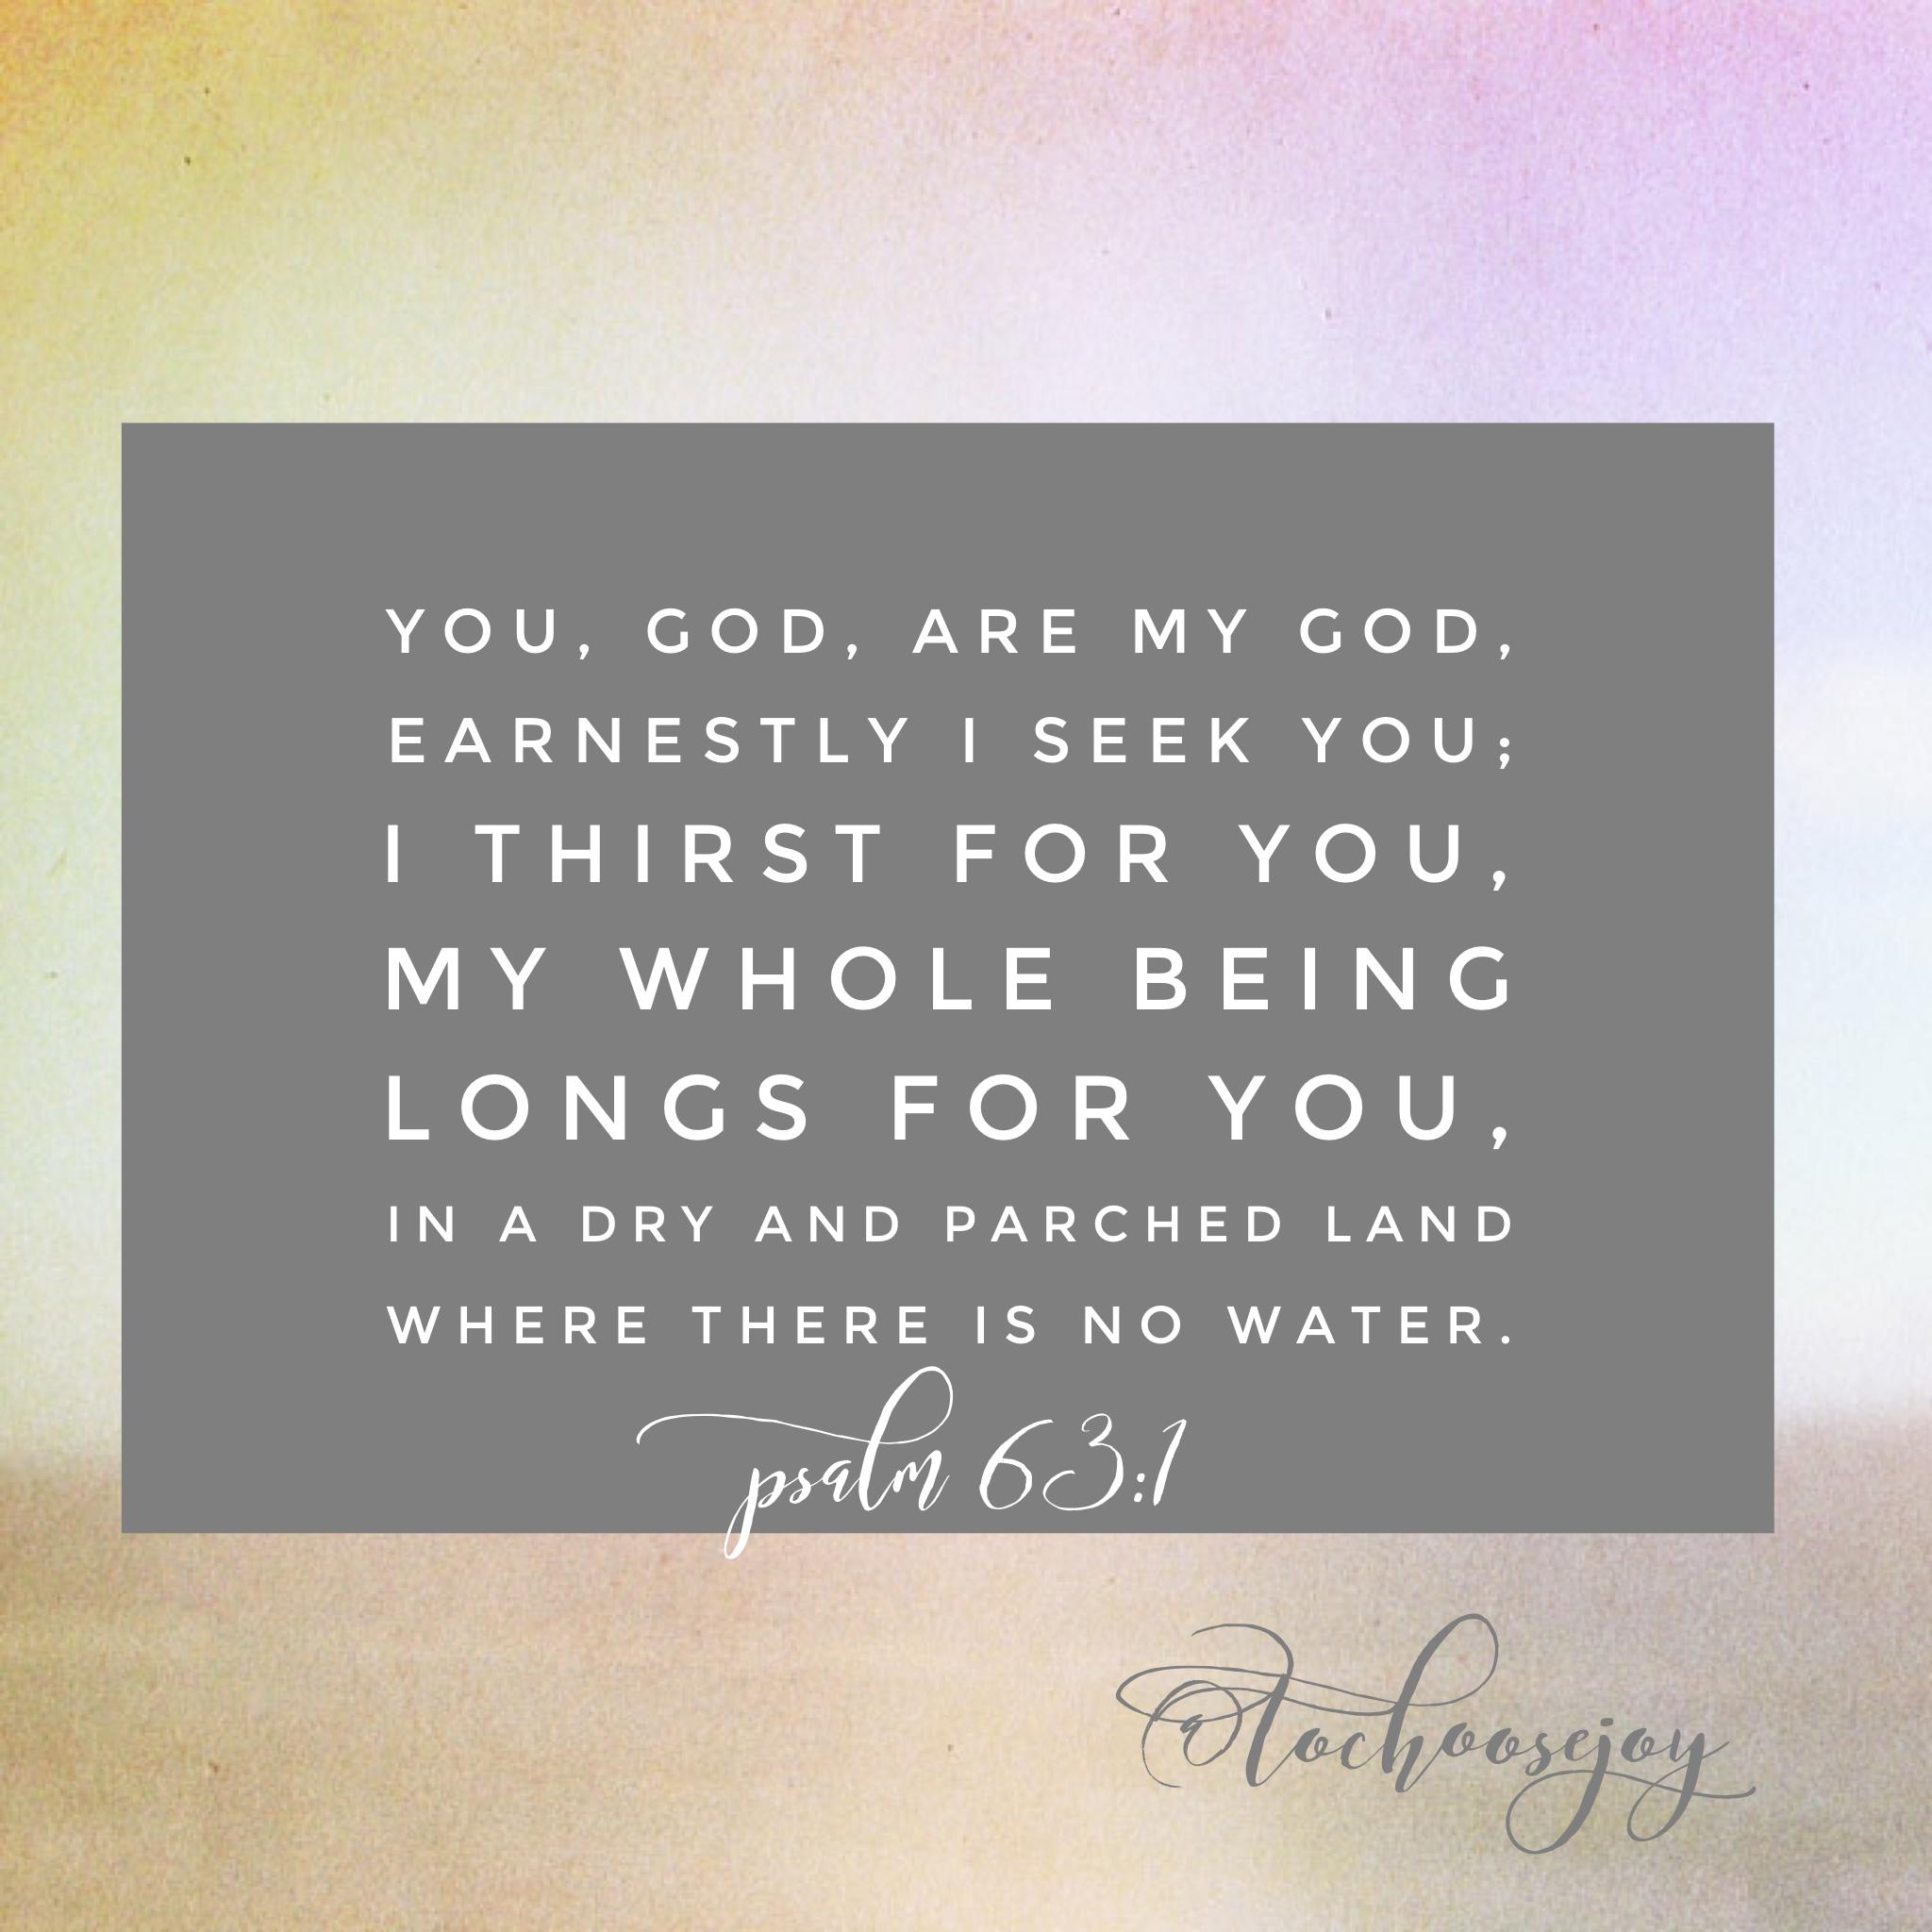 To Choose Joy Psalm 63:1 I thirst for you God